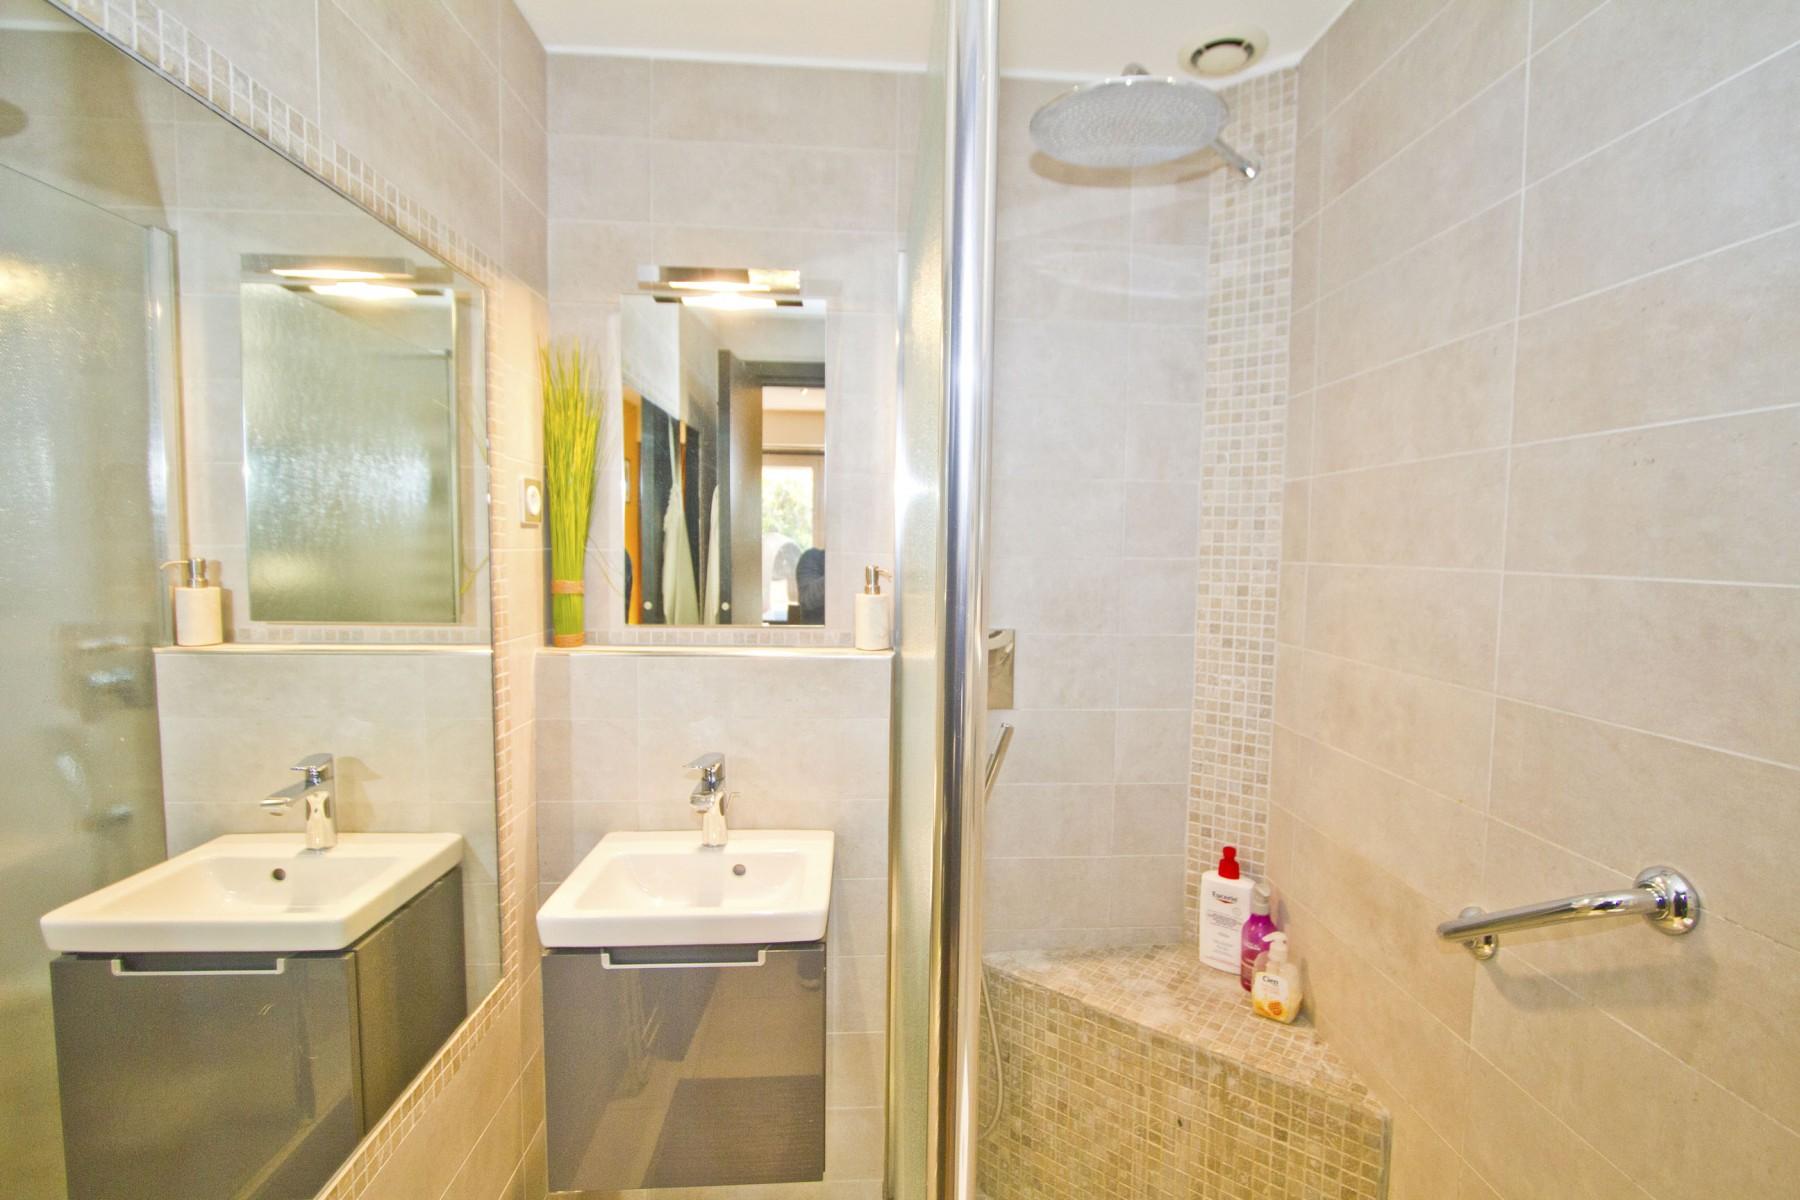 Apartments in Nice - SAN DIEGO GARDEN PROMENADE